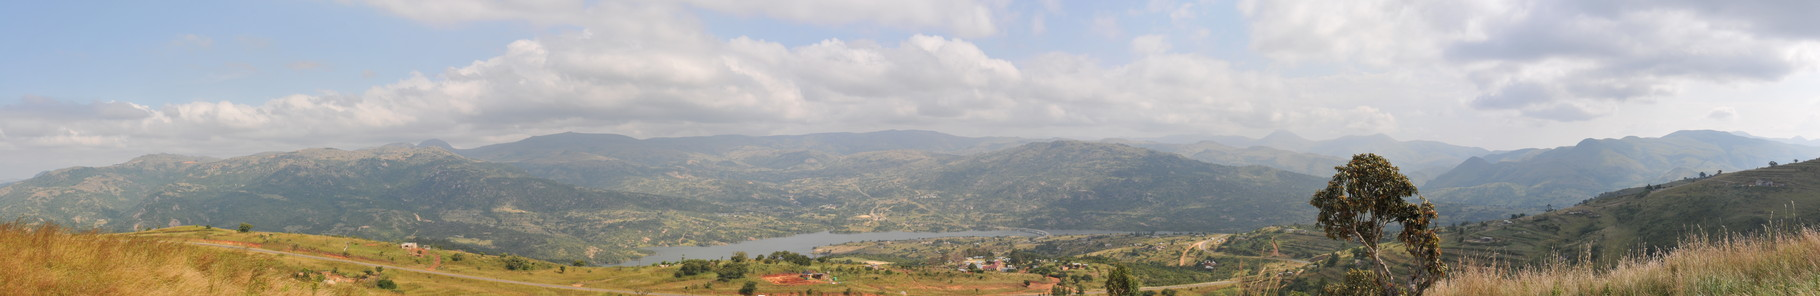 Swaziland          6 Bilder             M       ISO 200       f/11       1/320 s        18 mm   -Freihand-